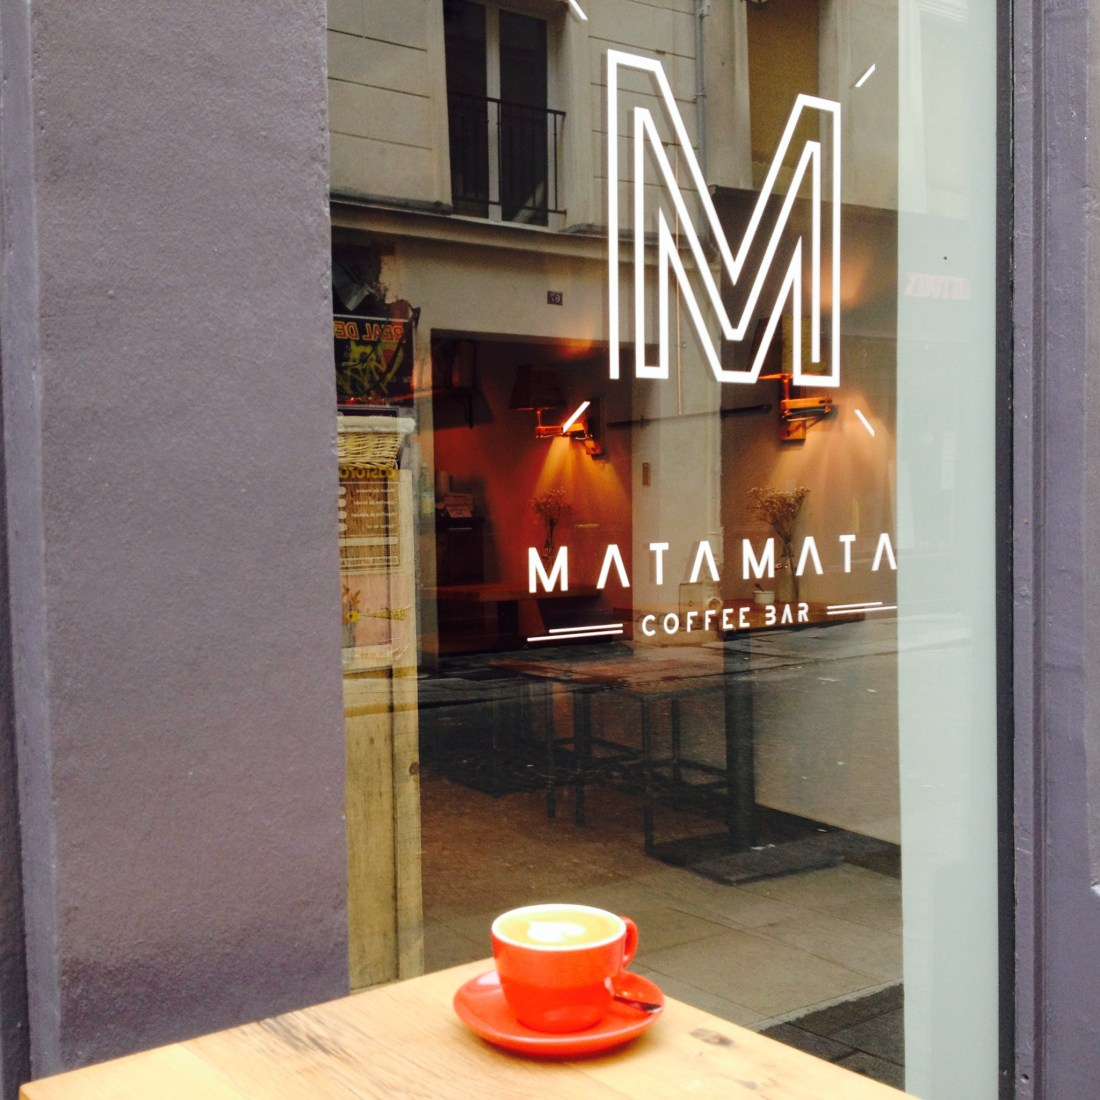 coffee_Shop_paris_rue dargout